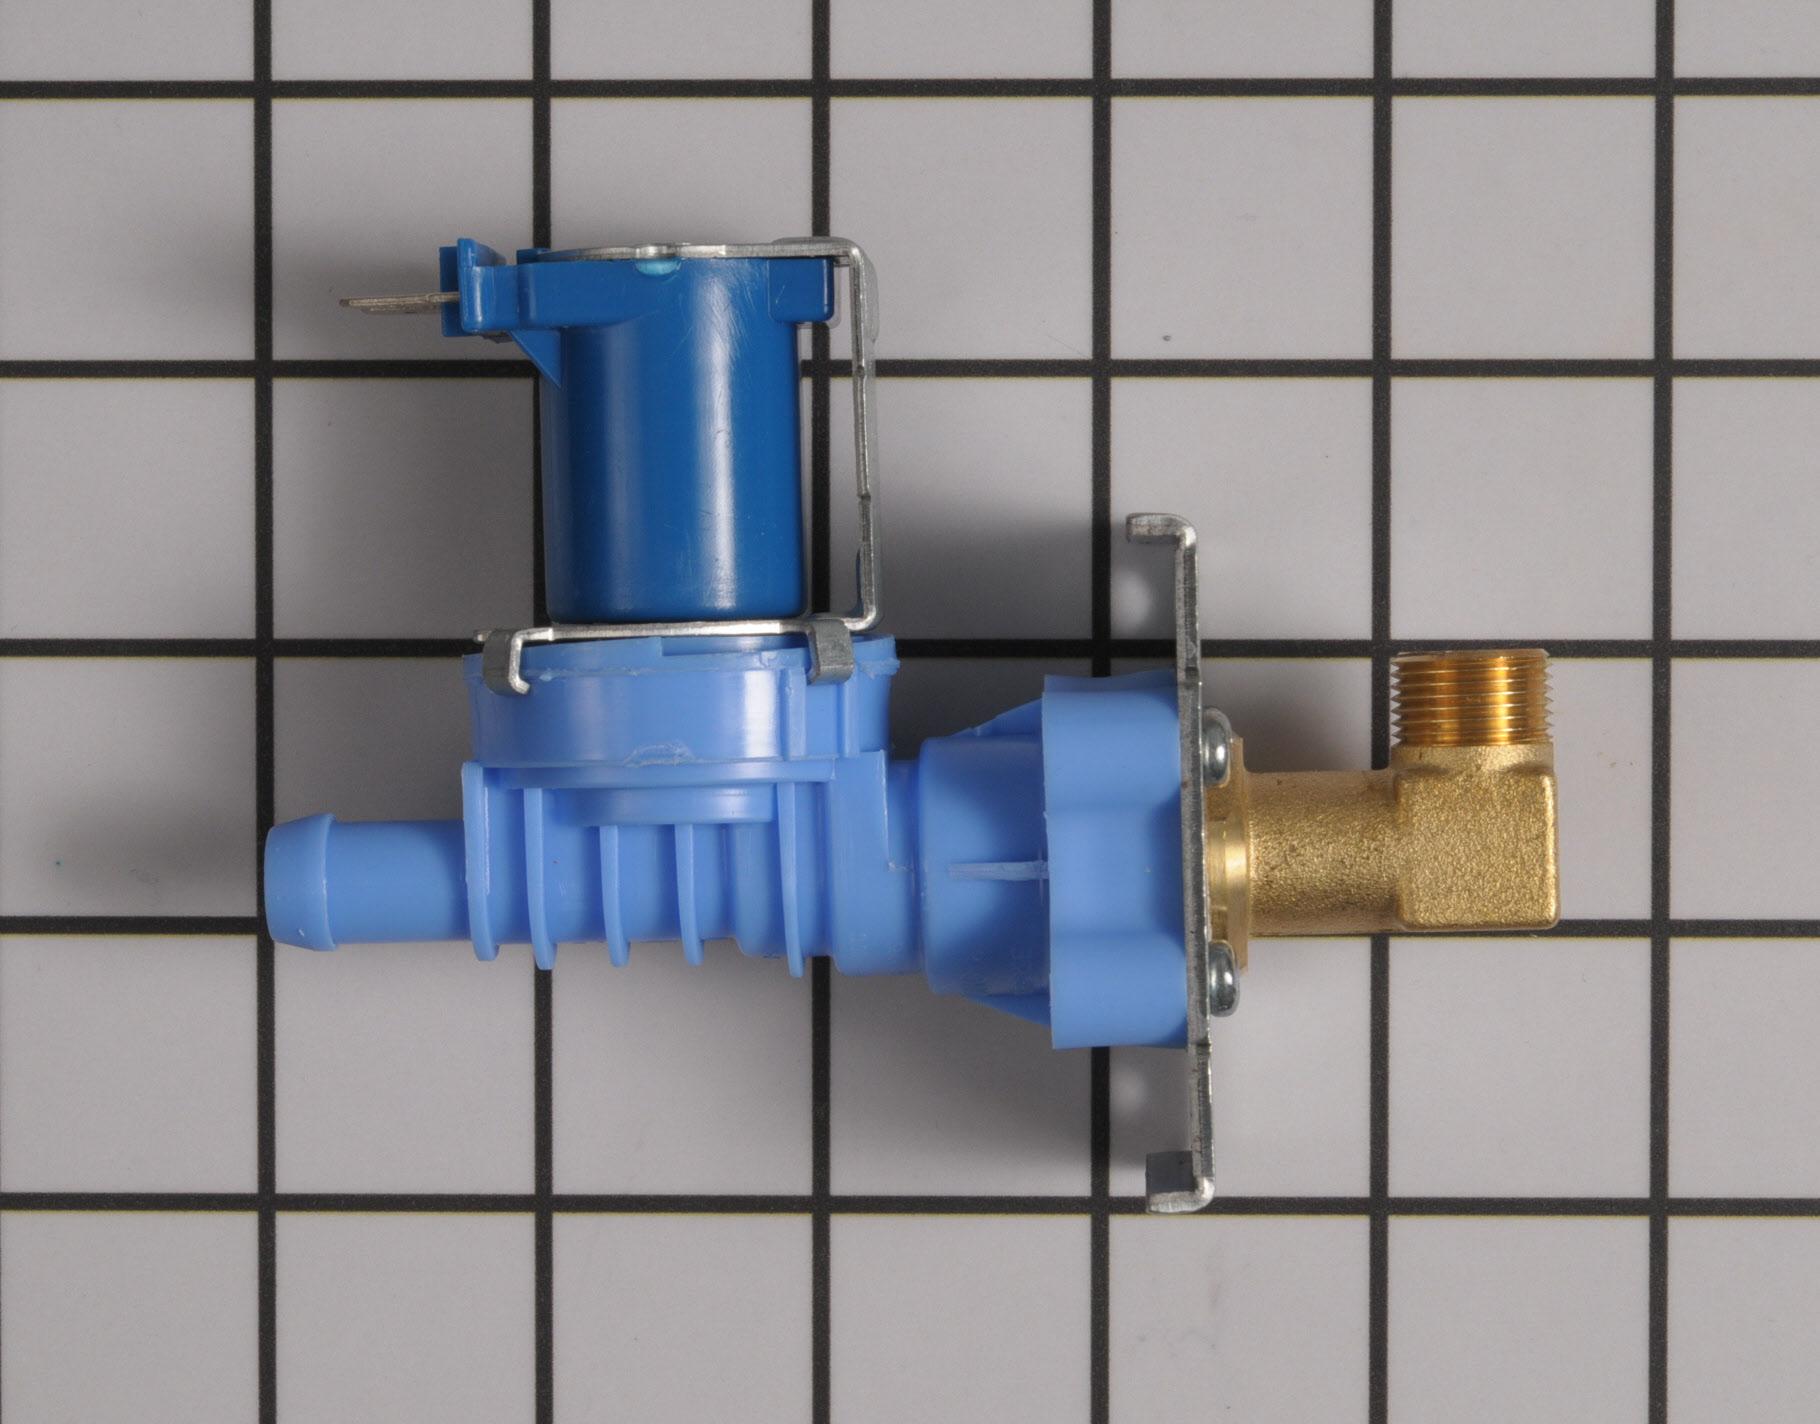 LG Dishwasher Part # 5221DD1001E - Water Inlet Valve